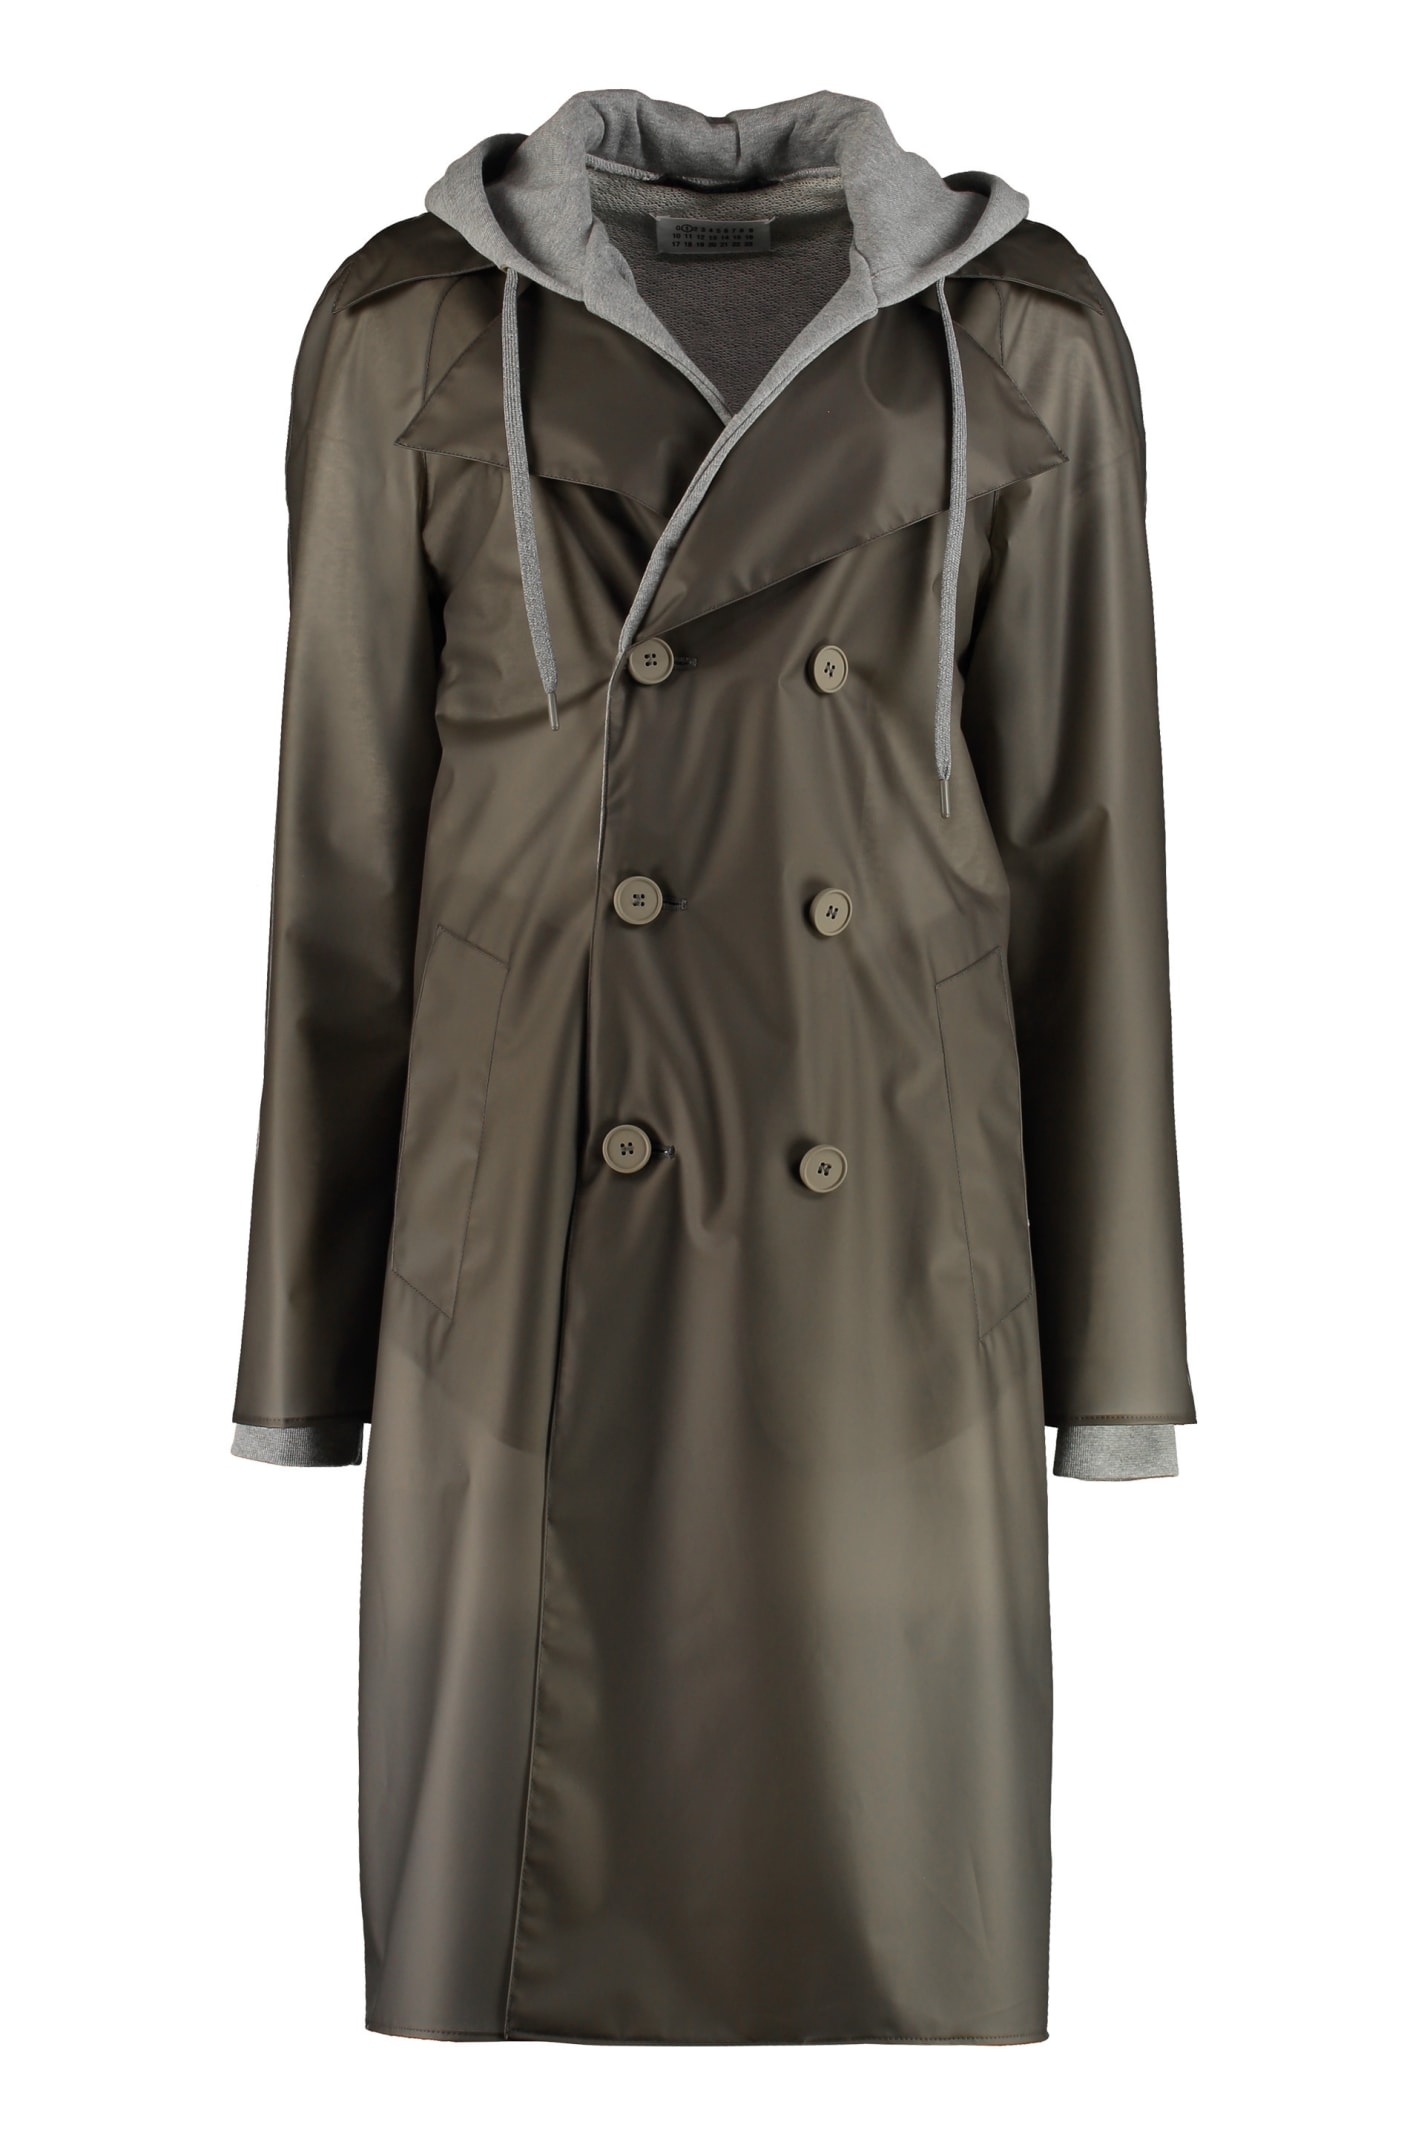 Maison Margiela Trench Coat With Inner Fleece Layer